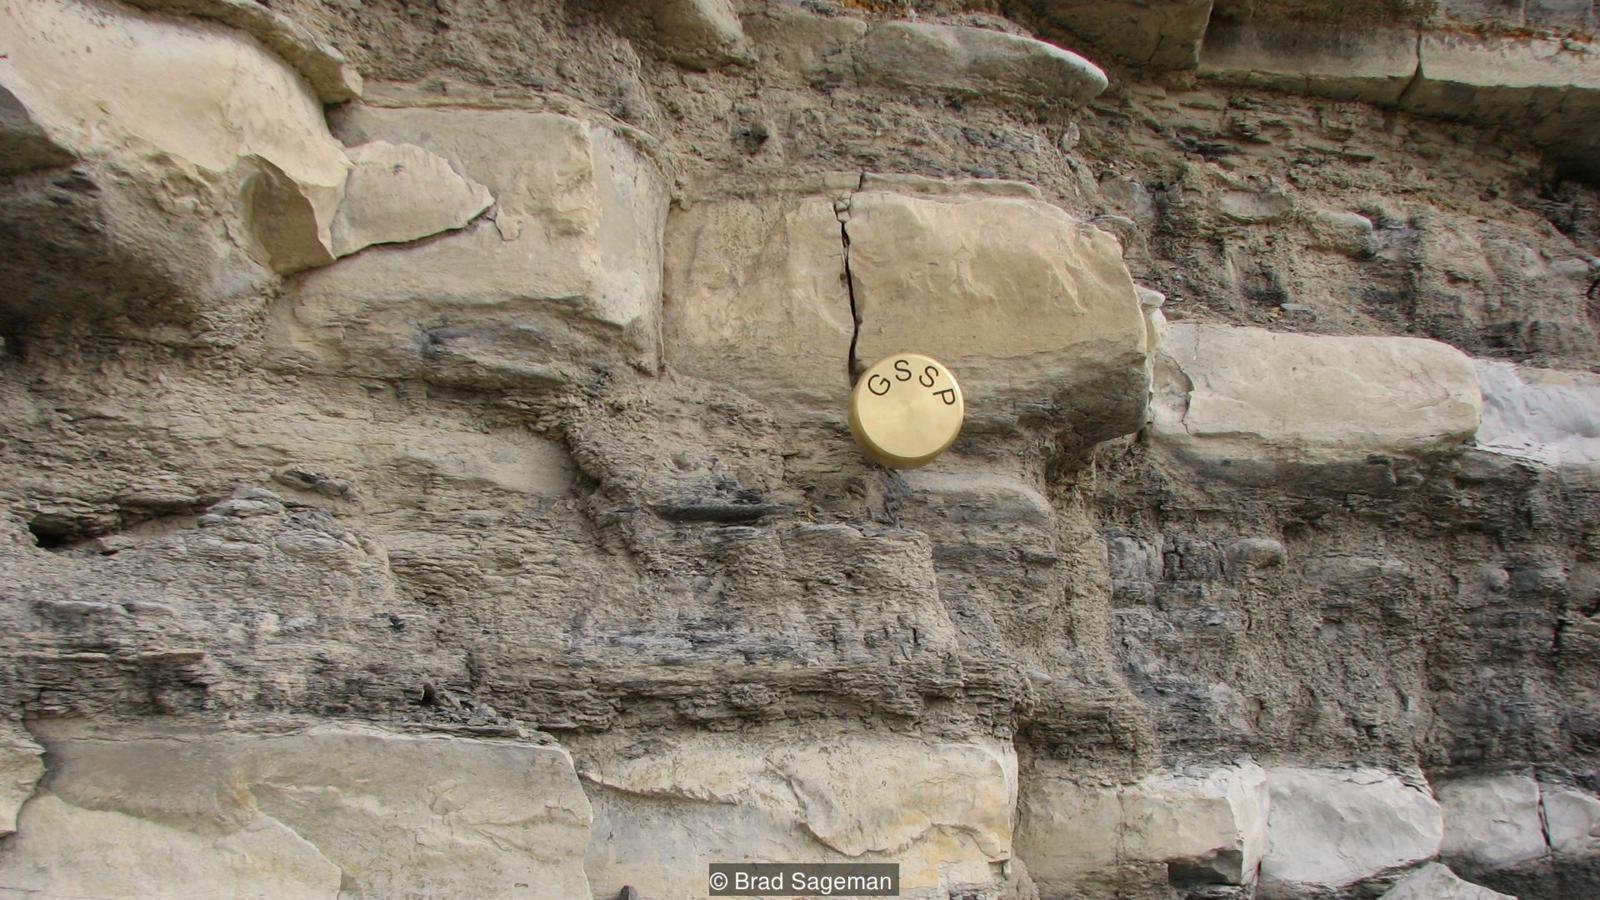 Каким местом на Земле можно отметить начало антропоцена?